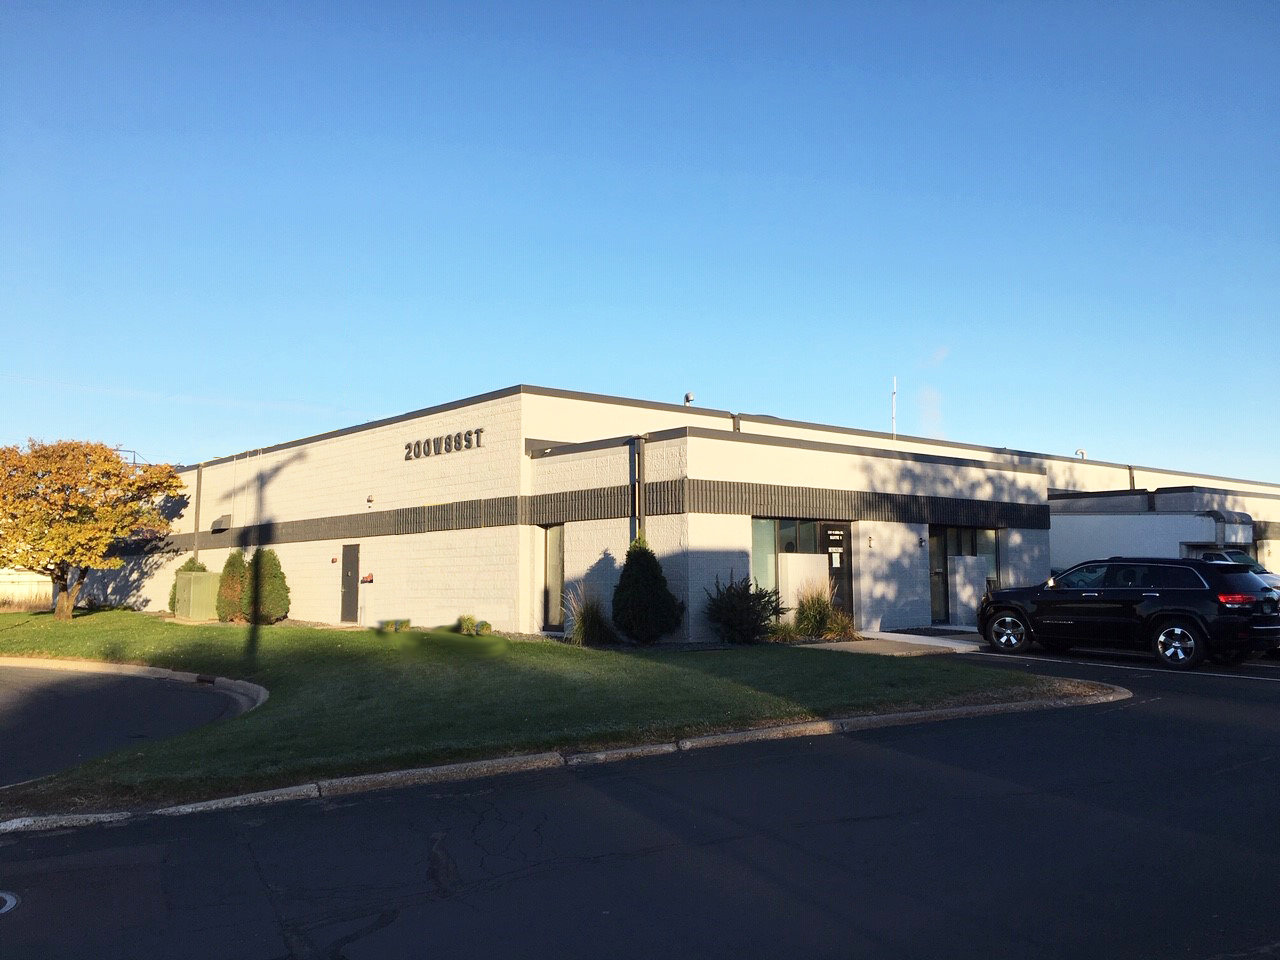 200 W 88th St, Bloomington, MN, 55420